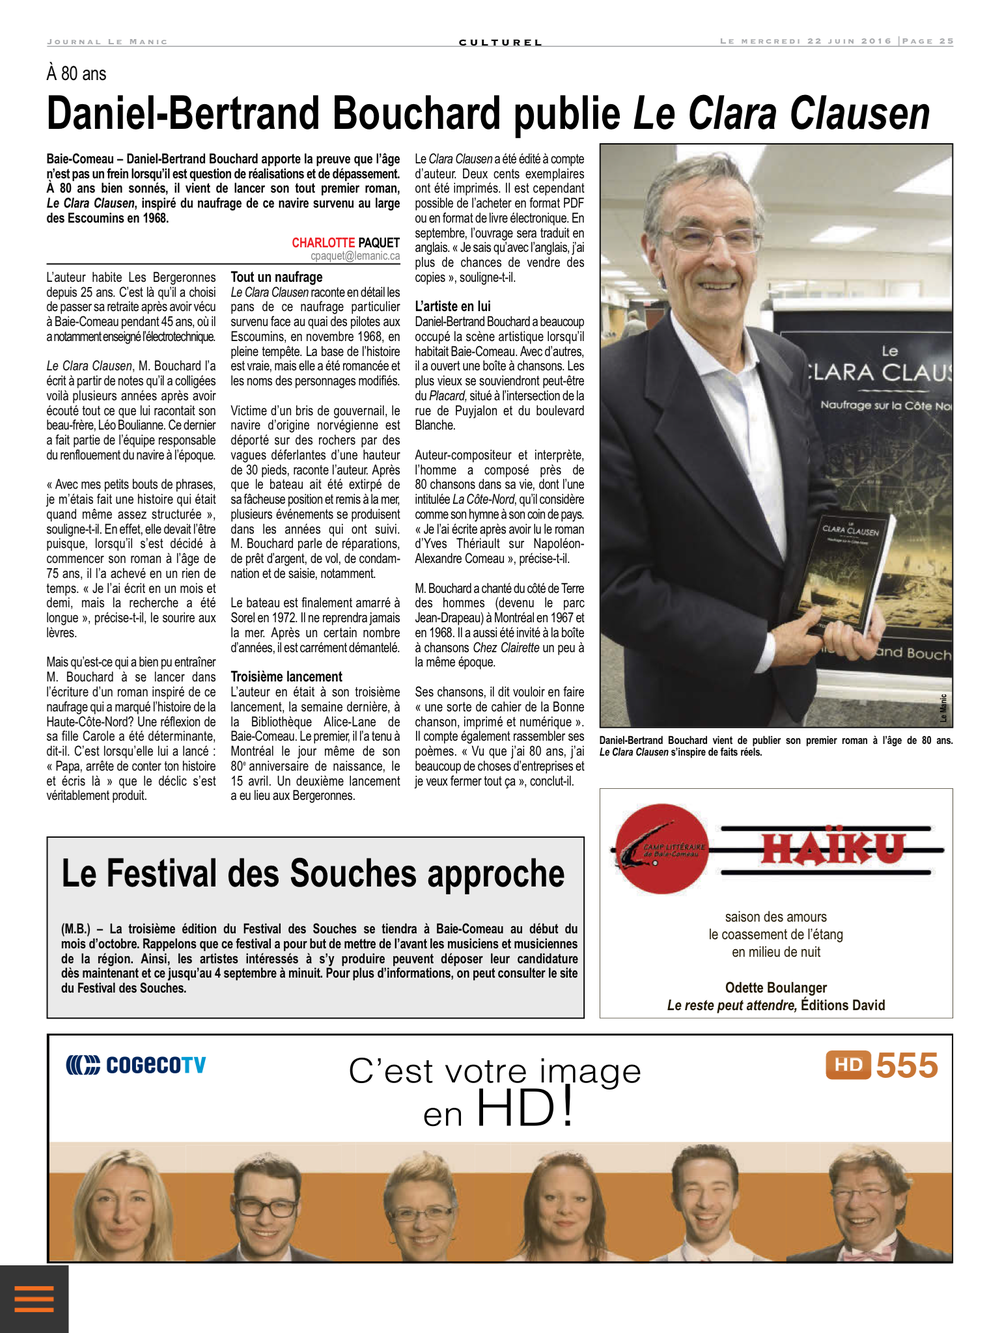 Journal Le Manic, Mercredi 22 Juin, 2016 Page 25